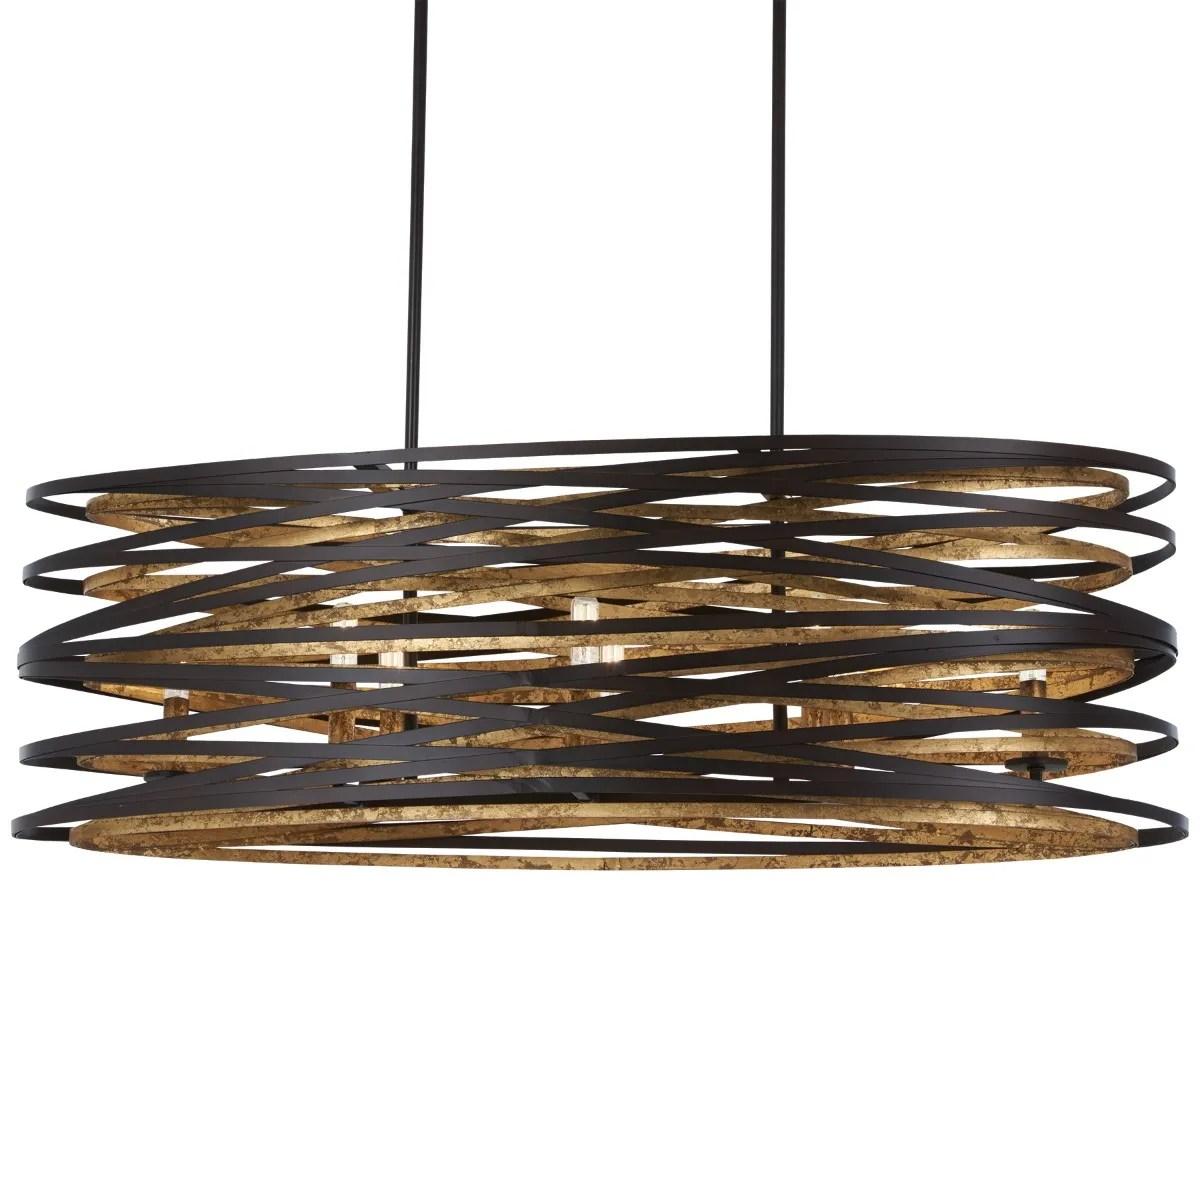 minka lavery vortic flow 8 light island pendant light in dark bronze